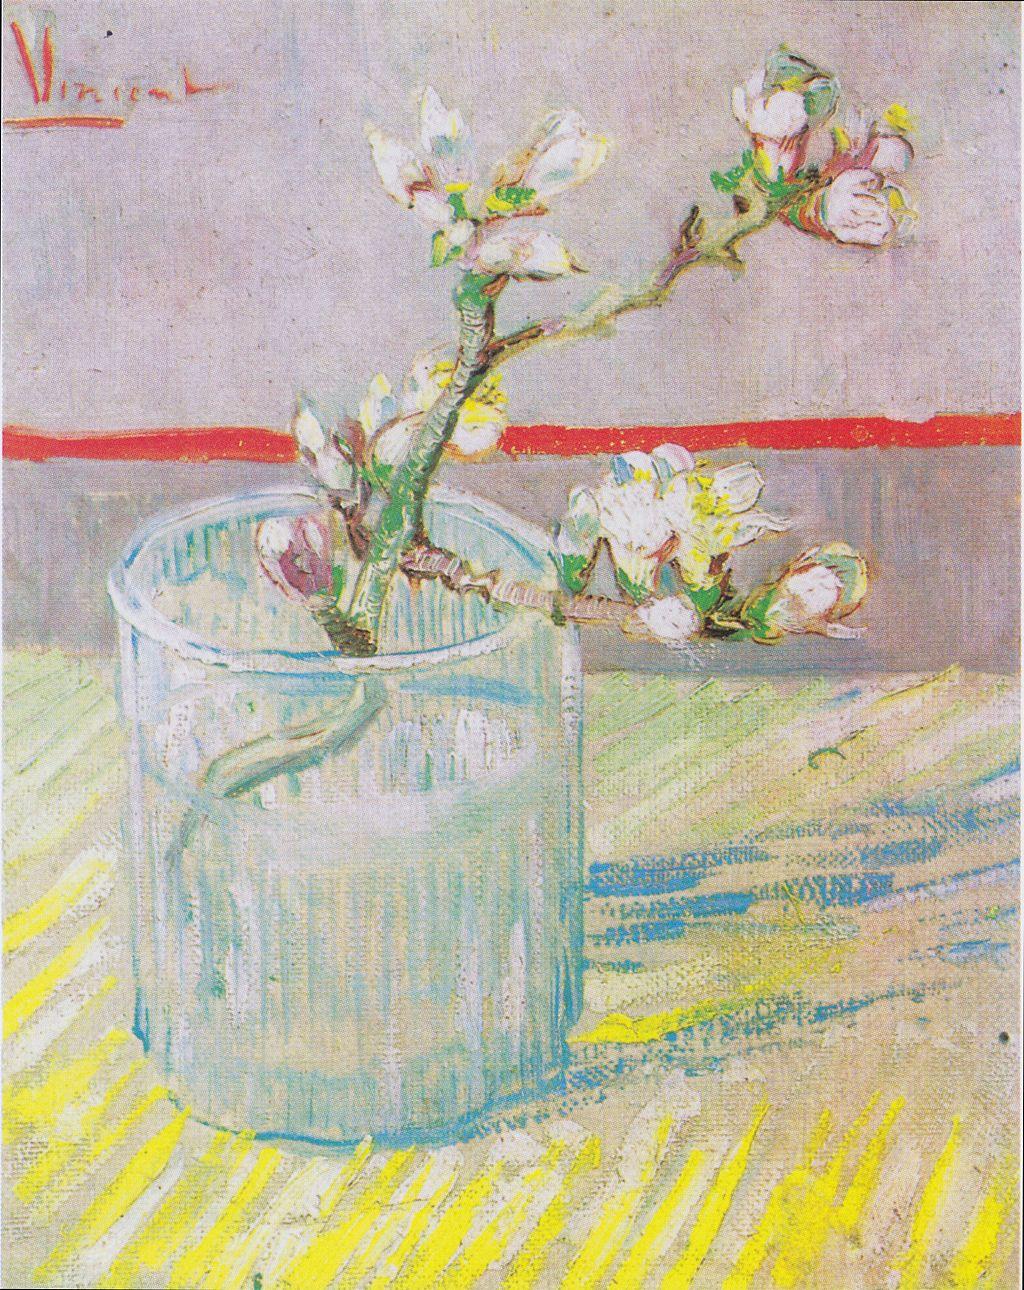 https://upload.wikimedia.org/wikipedia/commons/thumb/a/af/Van_Gogh_-_Bl%C3%BChender_Mandelbaumzweig_in_einem_Glas.jpeg/1024px-Van_Gogh_-_Bl%C3%BChender_Mandelbaumzweig_in_einem_Glas.jpeg